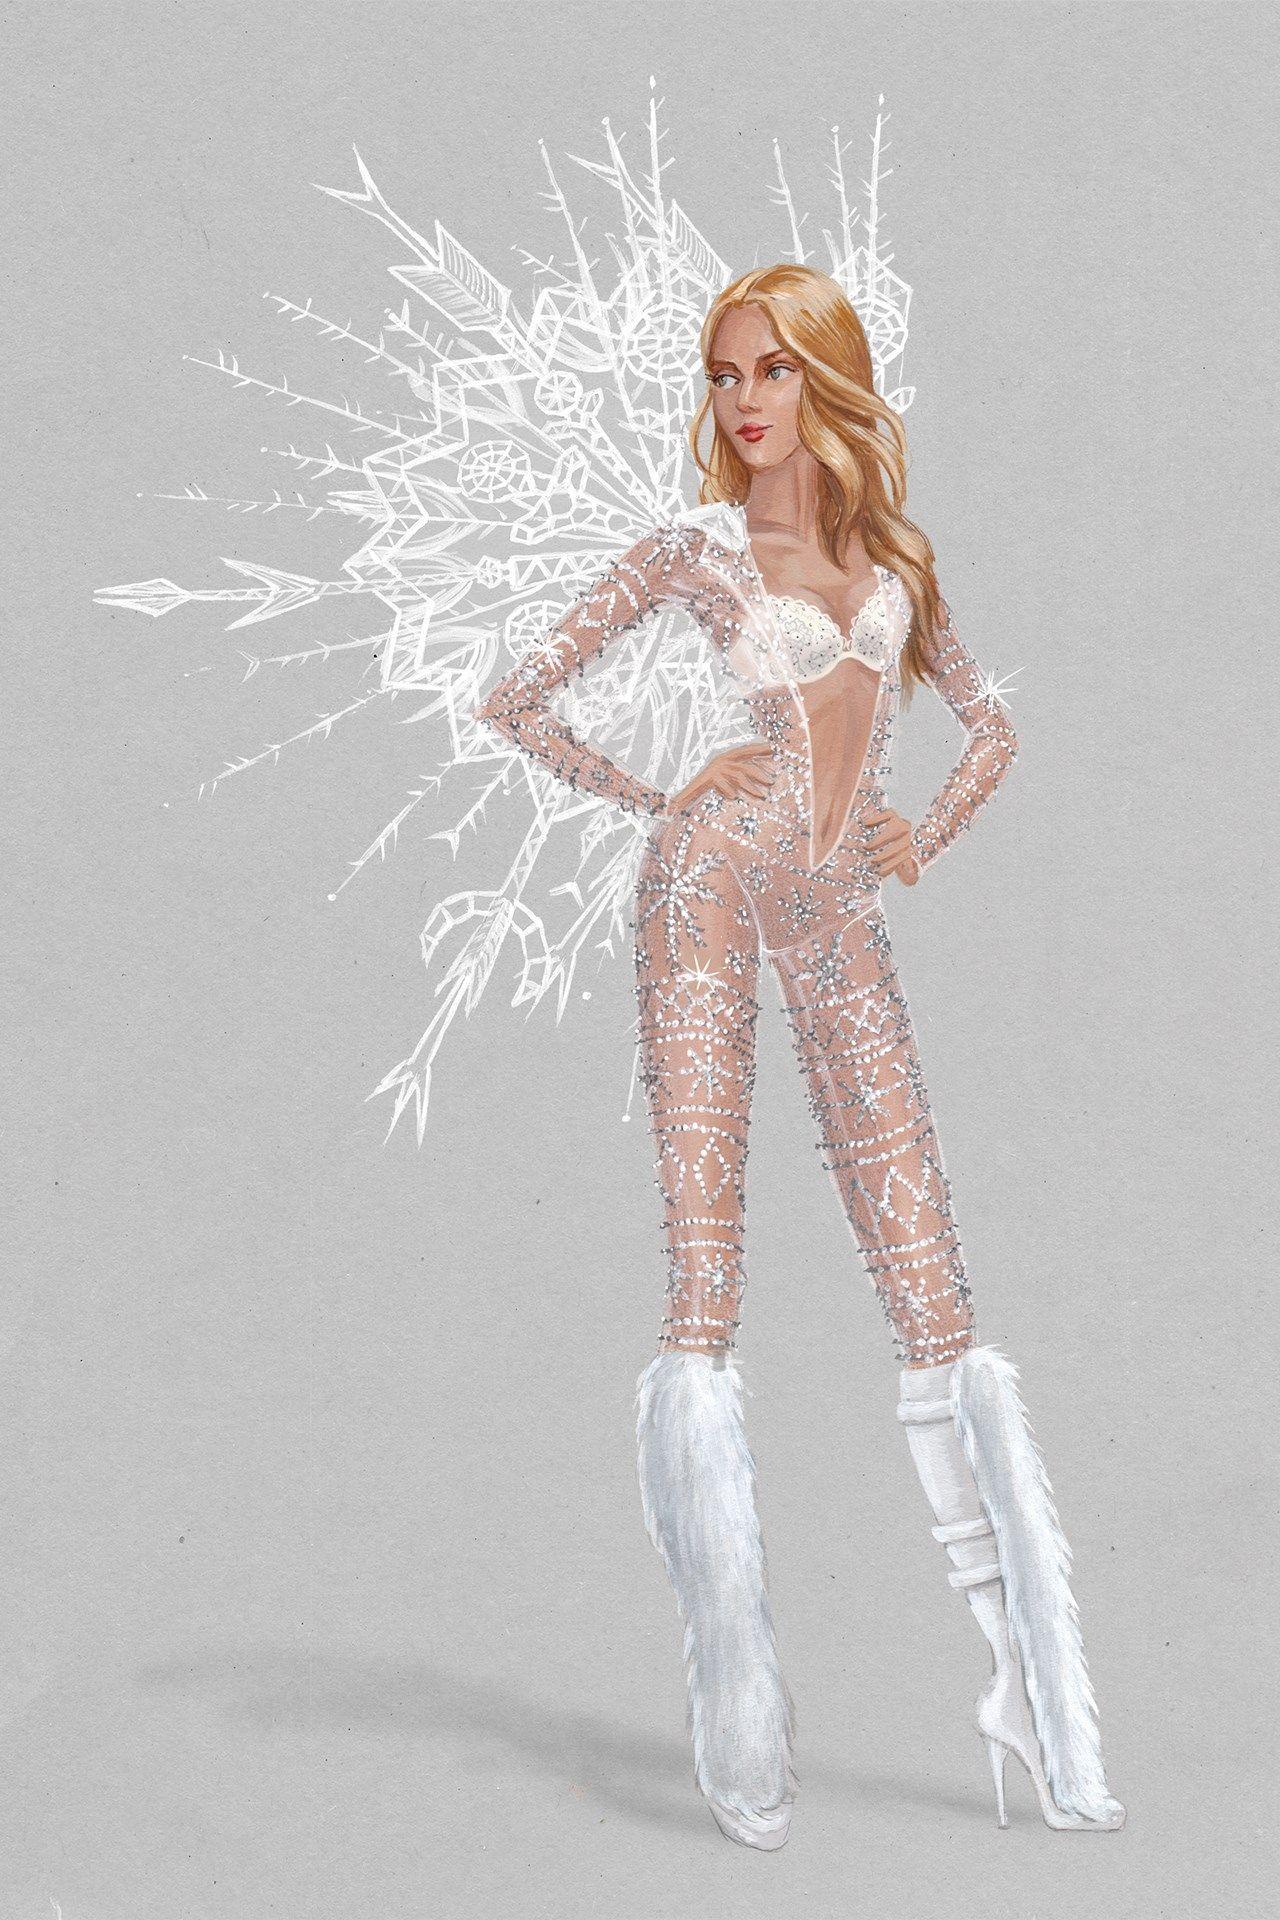 EXCLUSIVE: New Victoria's Secret Costumes Revealed